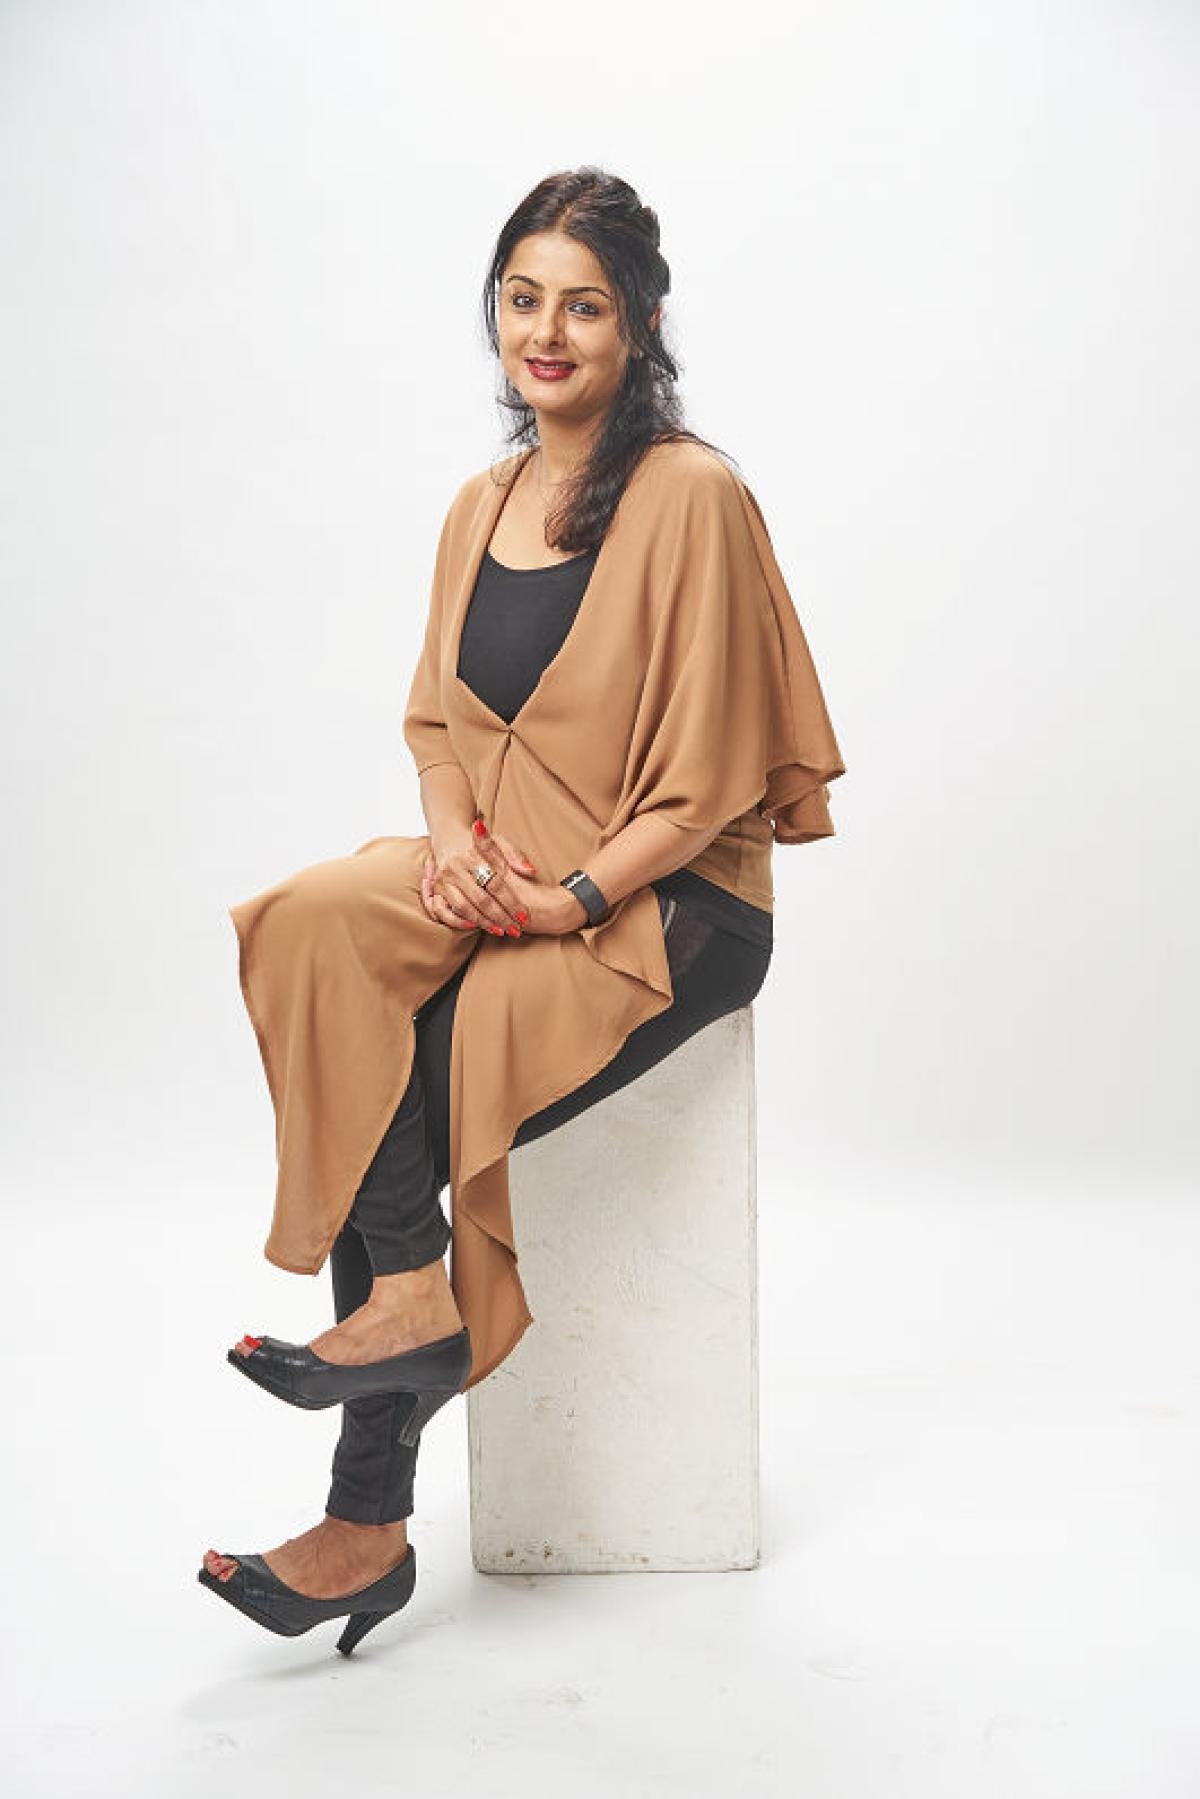 Sapangeet Rajwant, Head of Marketing, COLORS